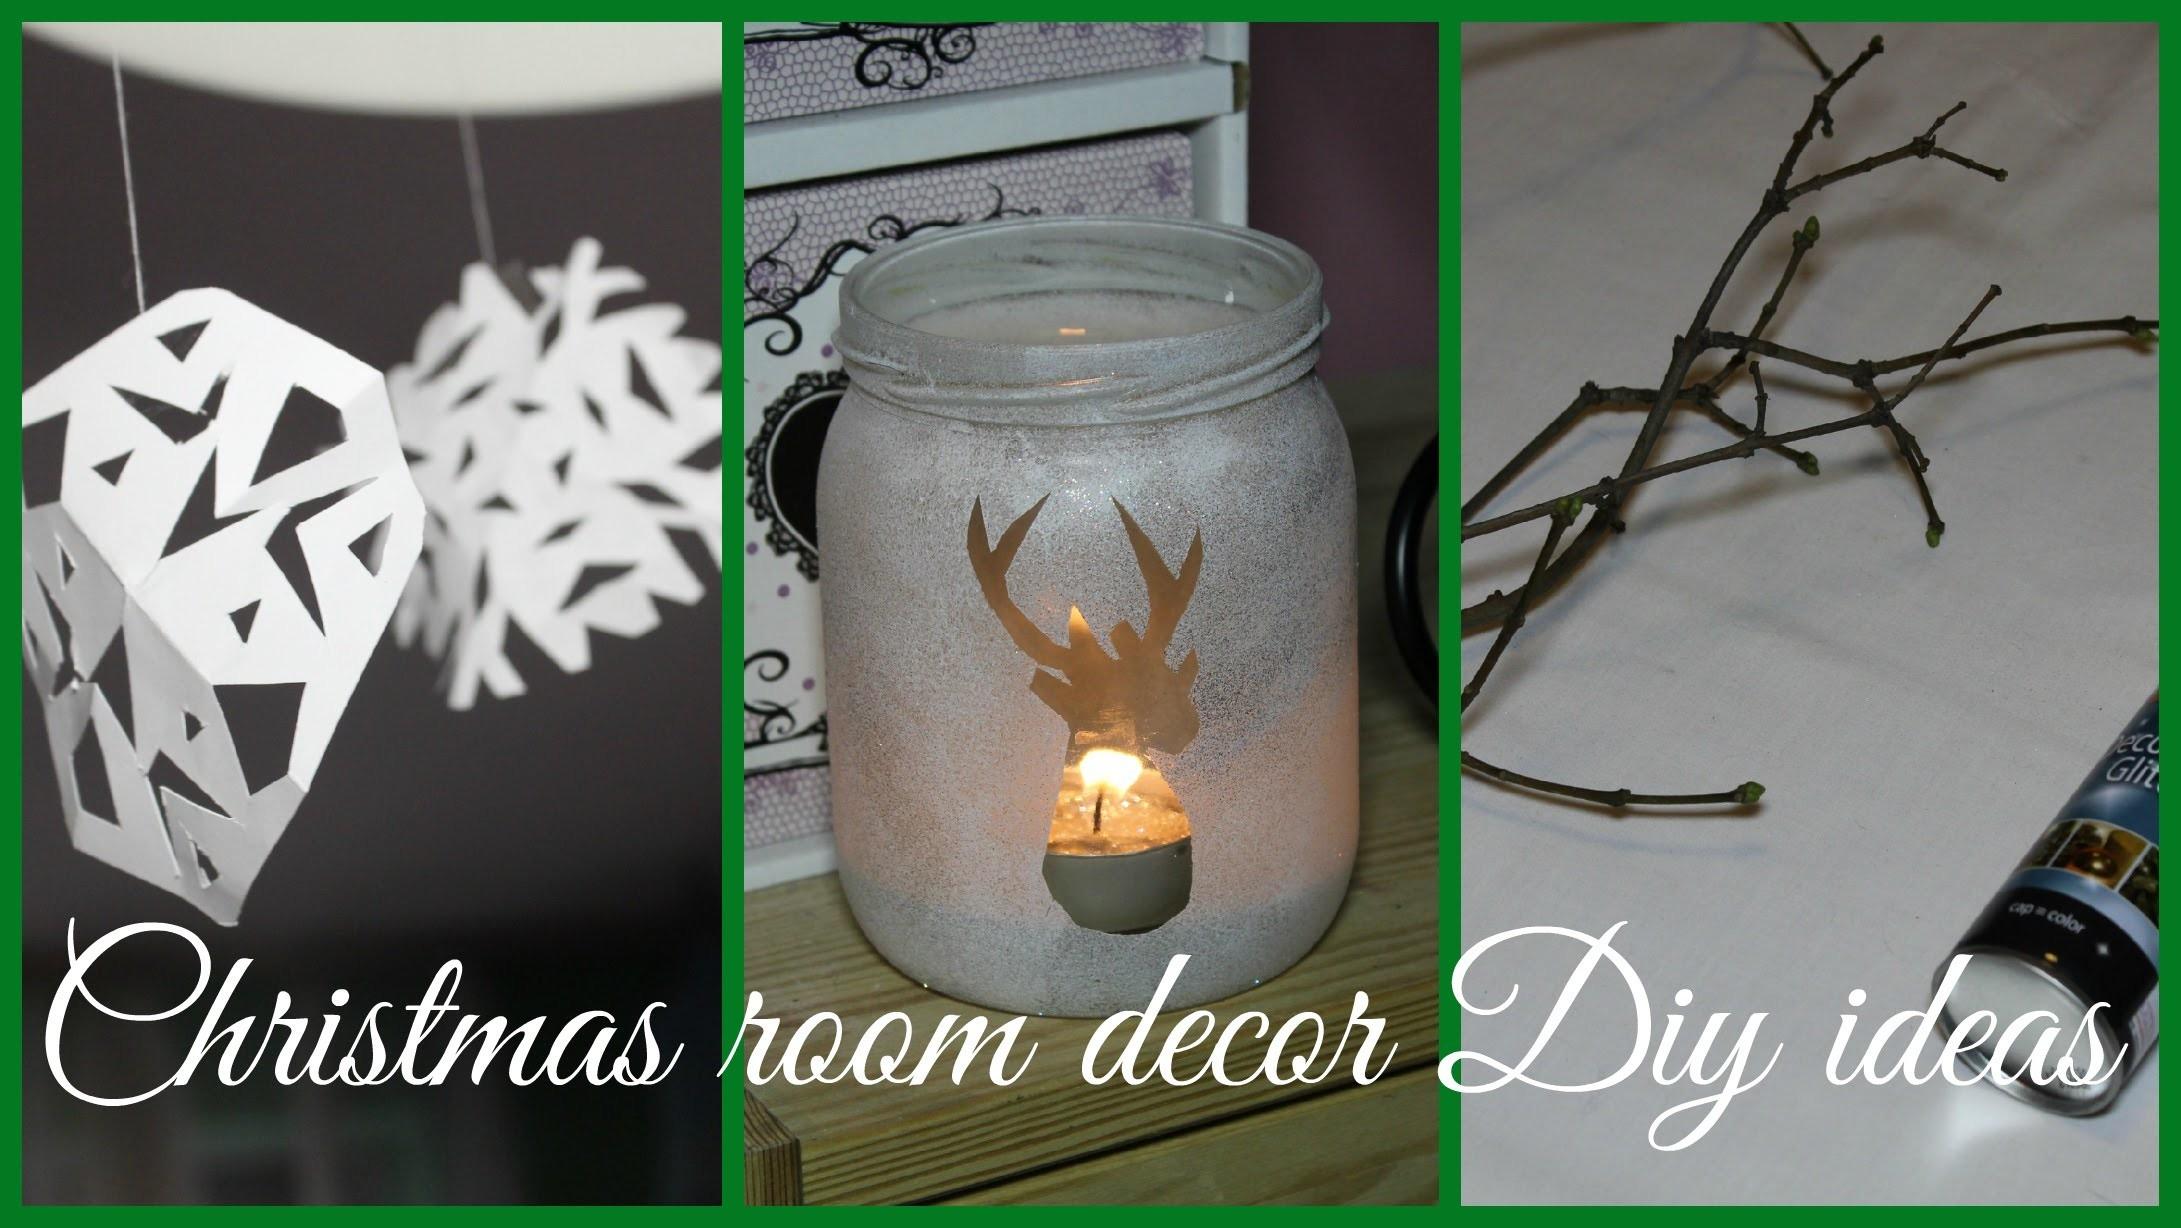 ❄ CHRISTMAS ROOM DECOR DIY IDEAS! ❄ collab w. vdabrovska&ola sidorowska